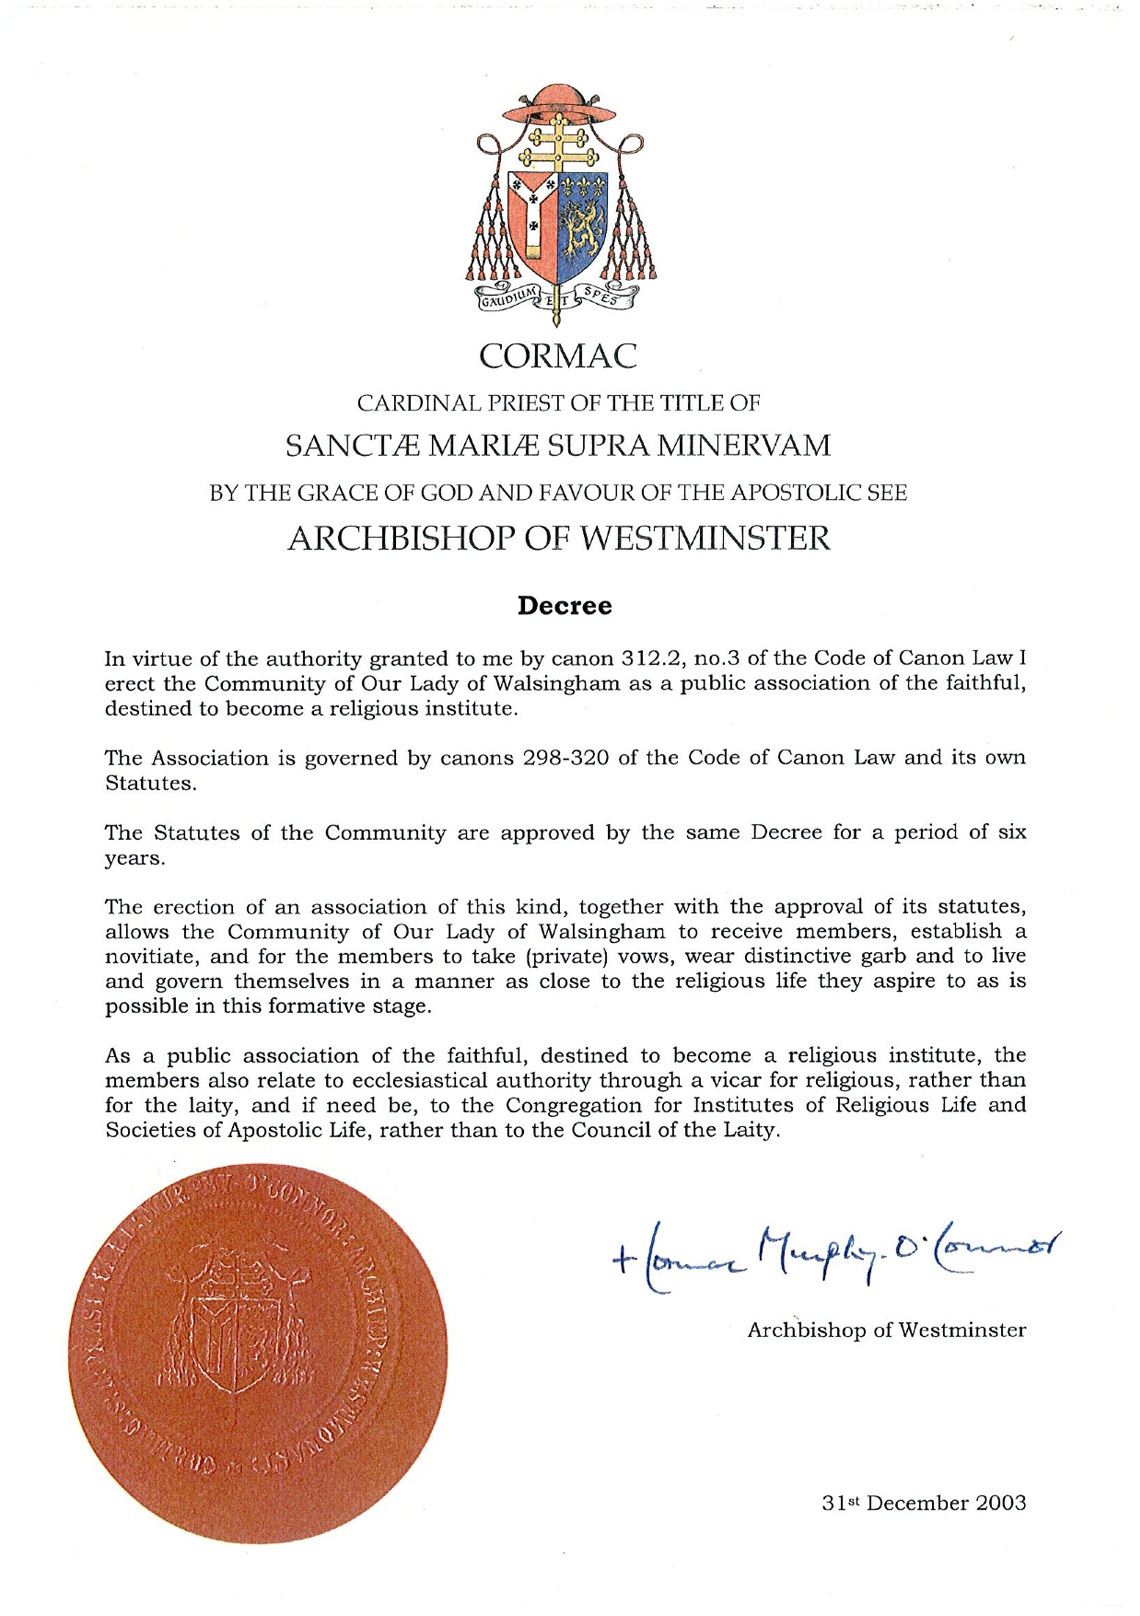 Decree establishing the Community